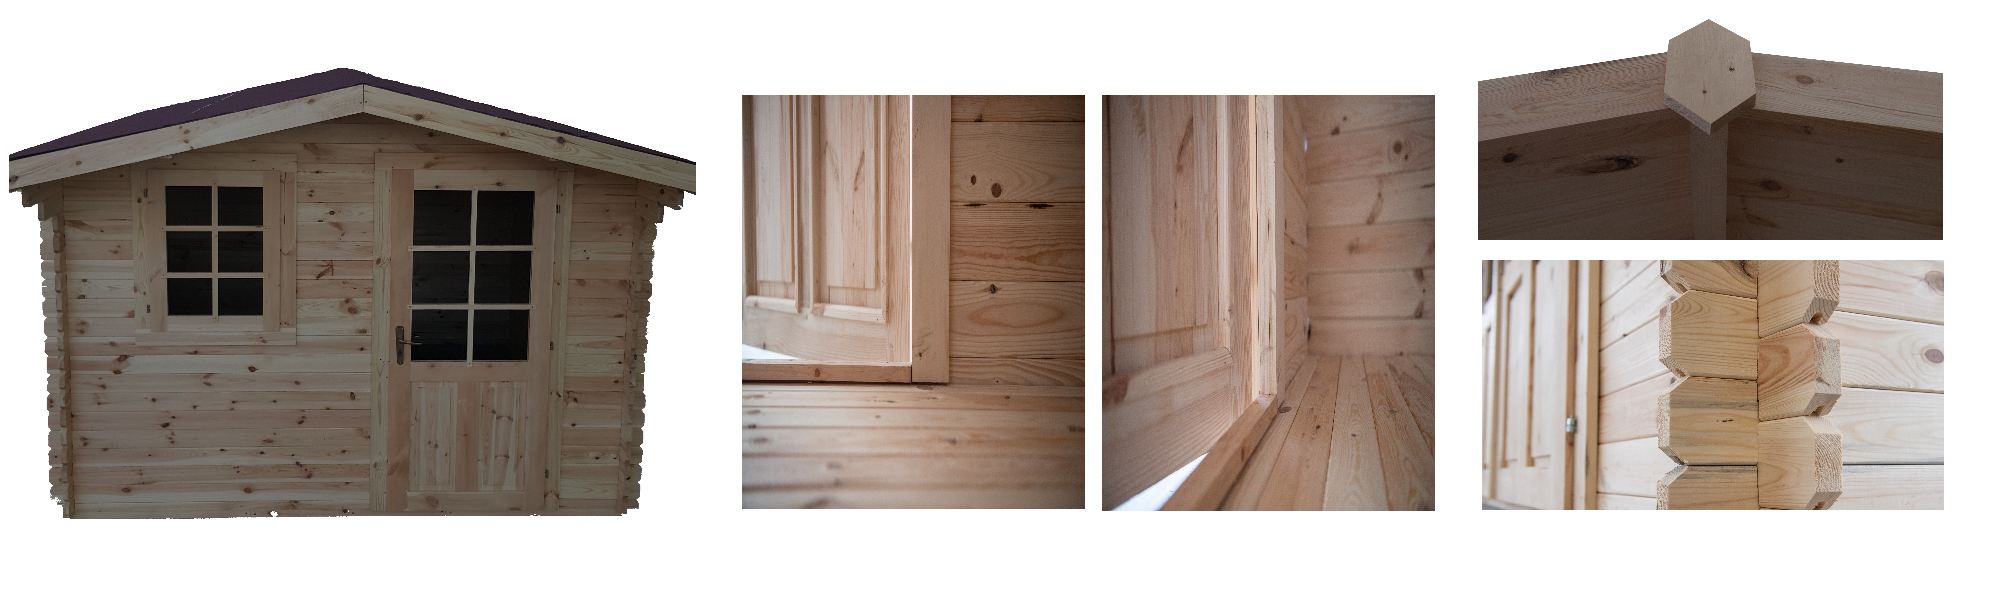 Block House porta singola_28mm_dettagli